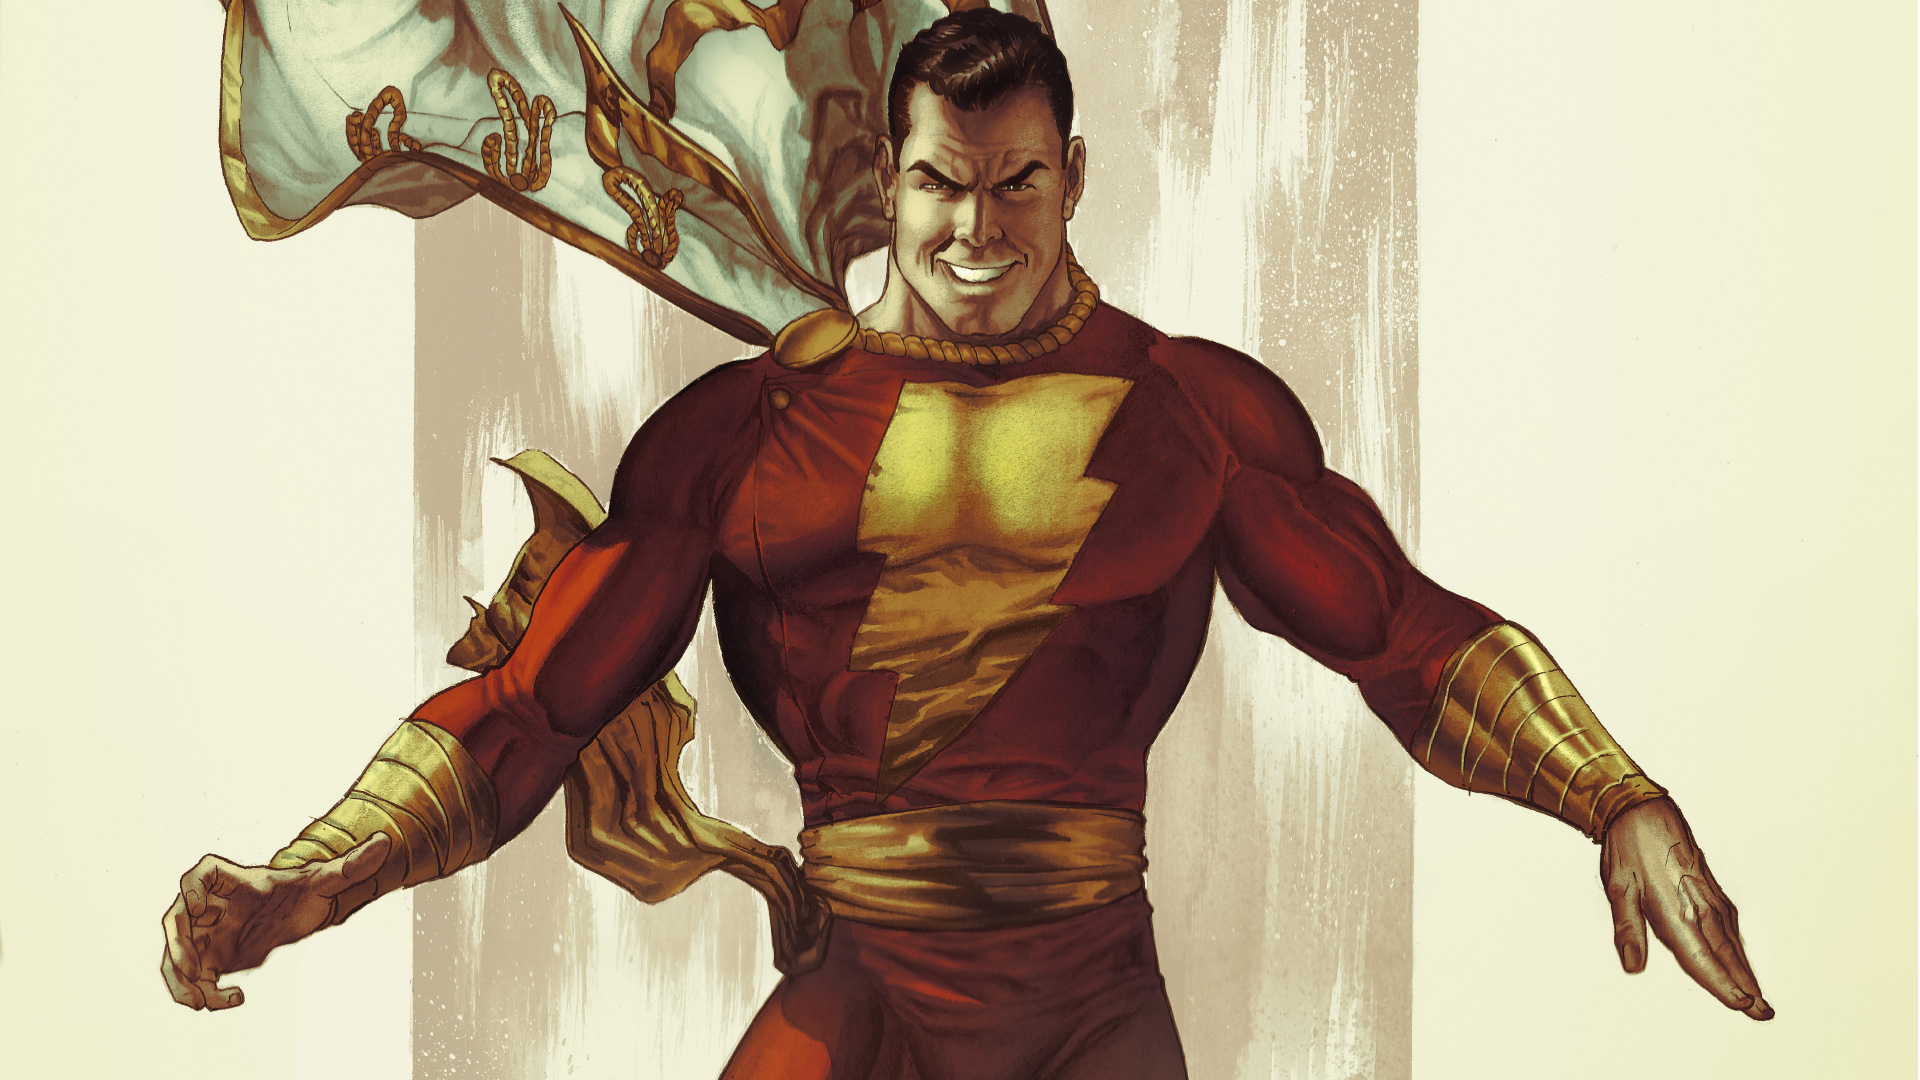 Shazam Comic Artwork Hd Superheroes 4k Wallpapers Images